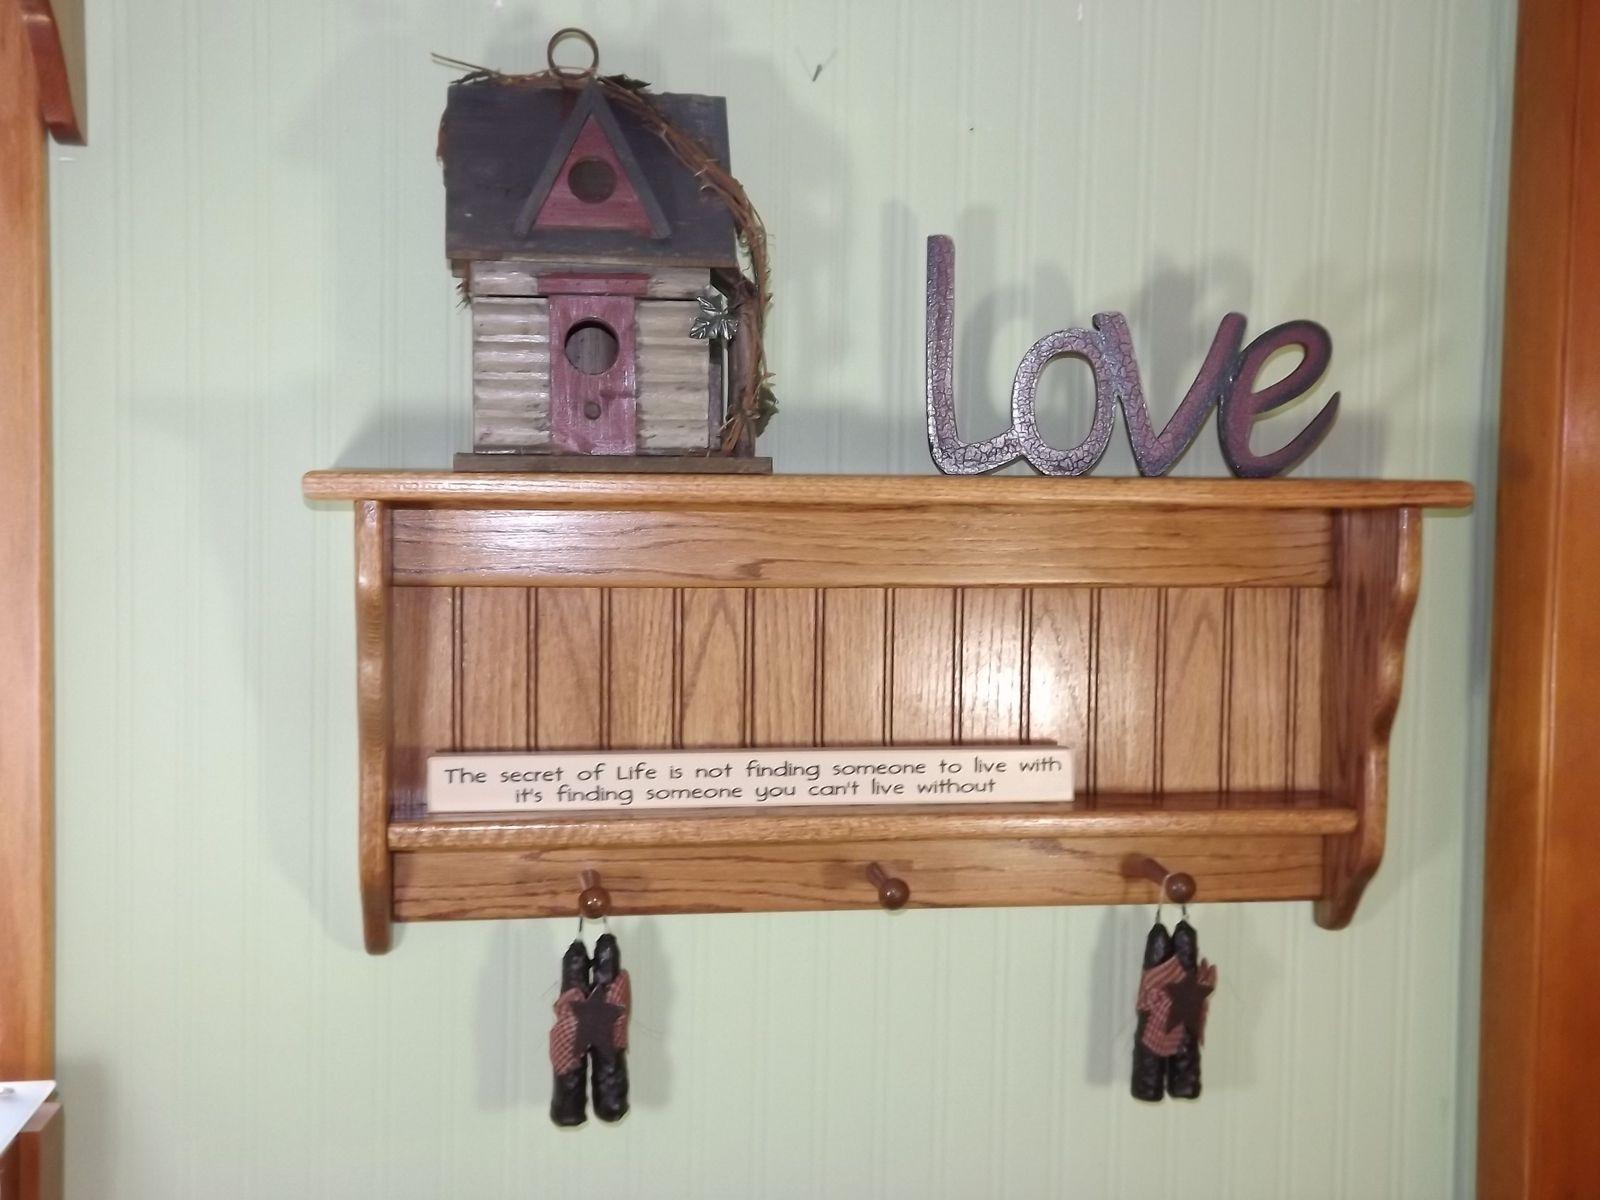 Hand Made Solid Oak Coat Racks Wall Shelves By Appletree